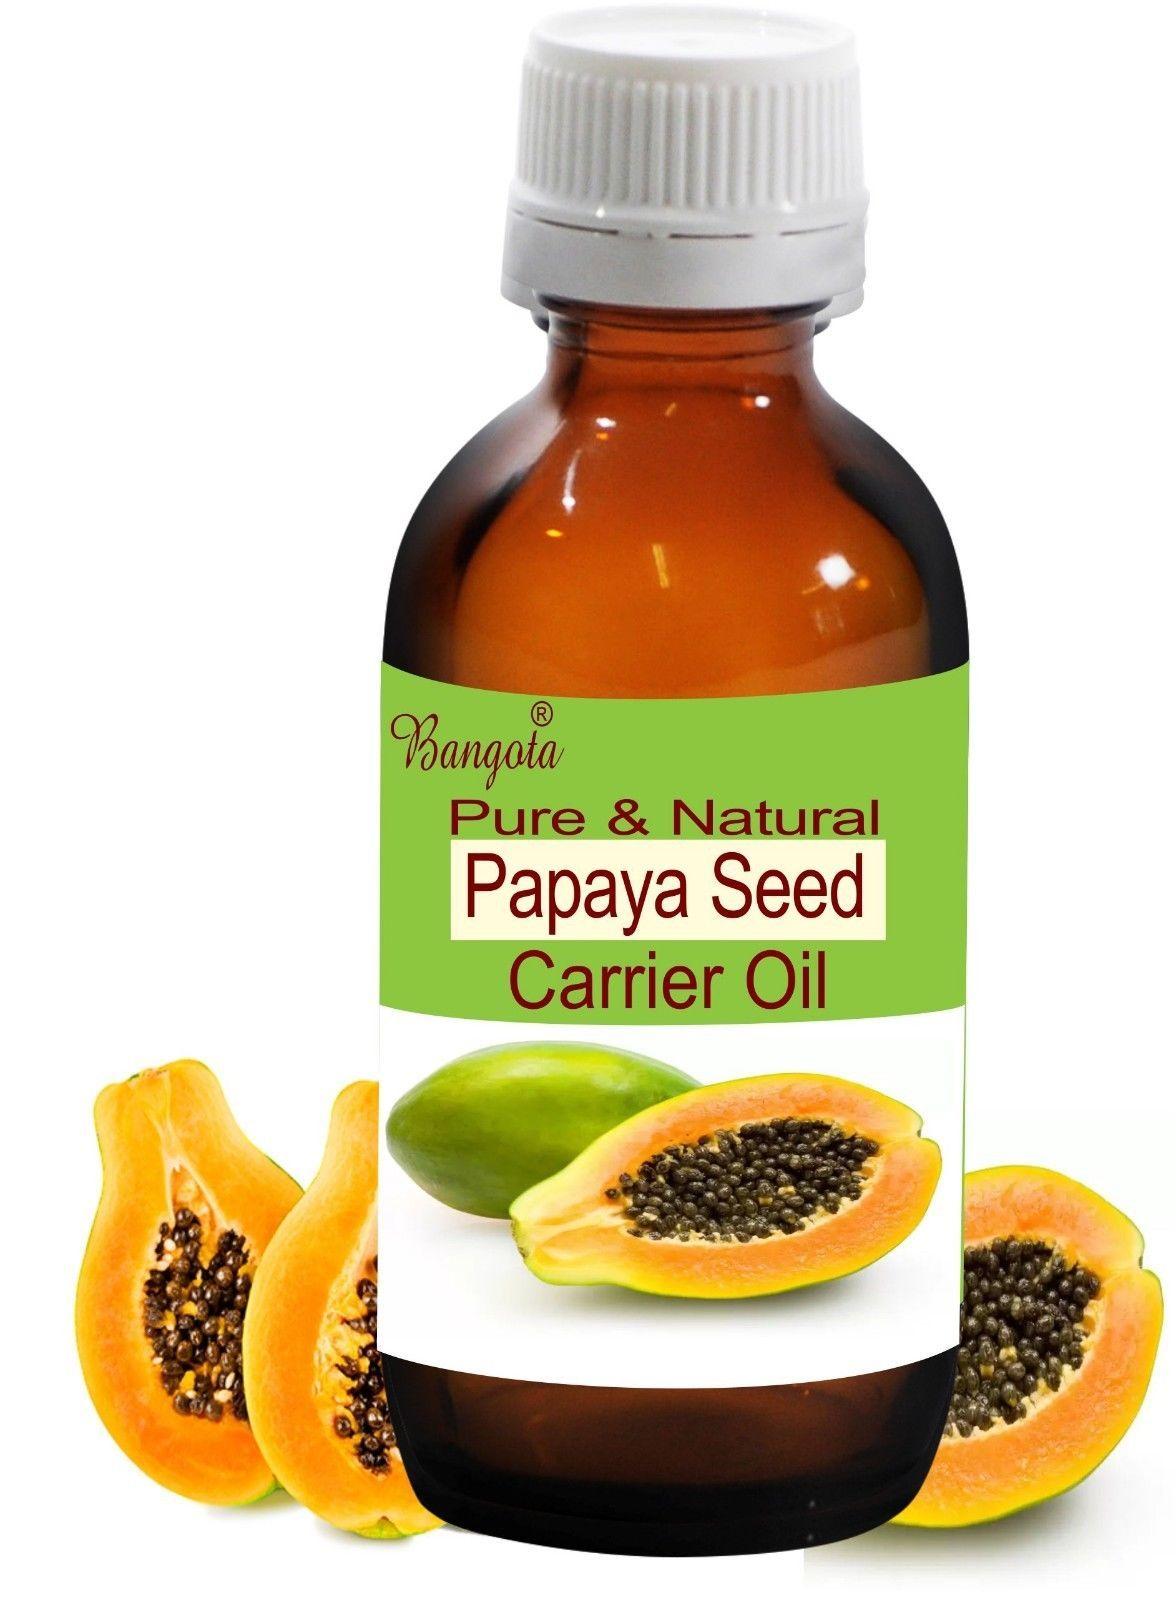 Papaya Seed oil-Pure & Natural Carrier Oil- 30ml Carica papaya by Bangota